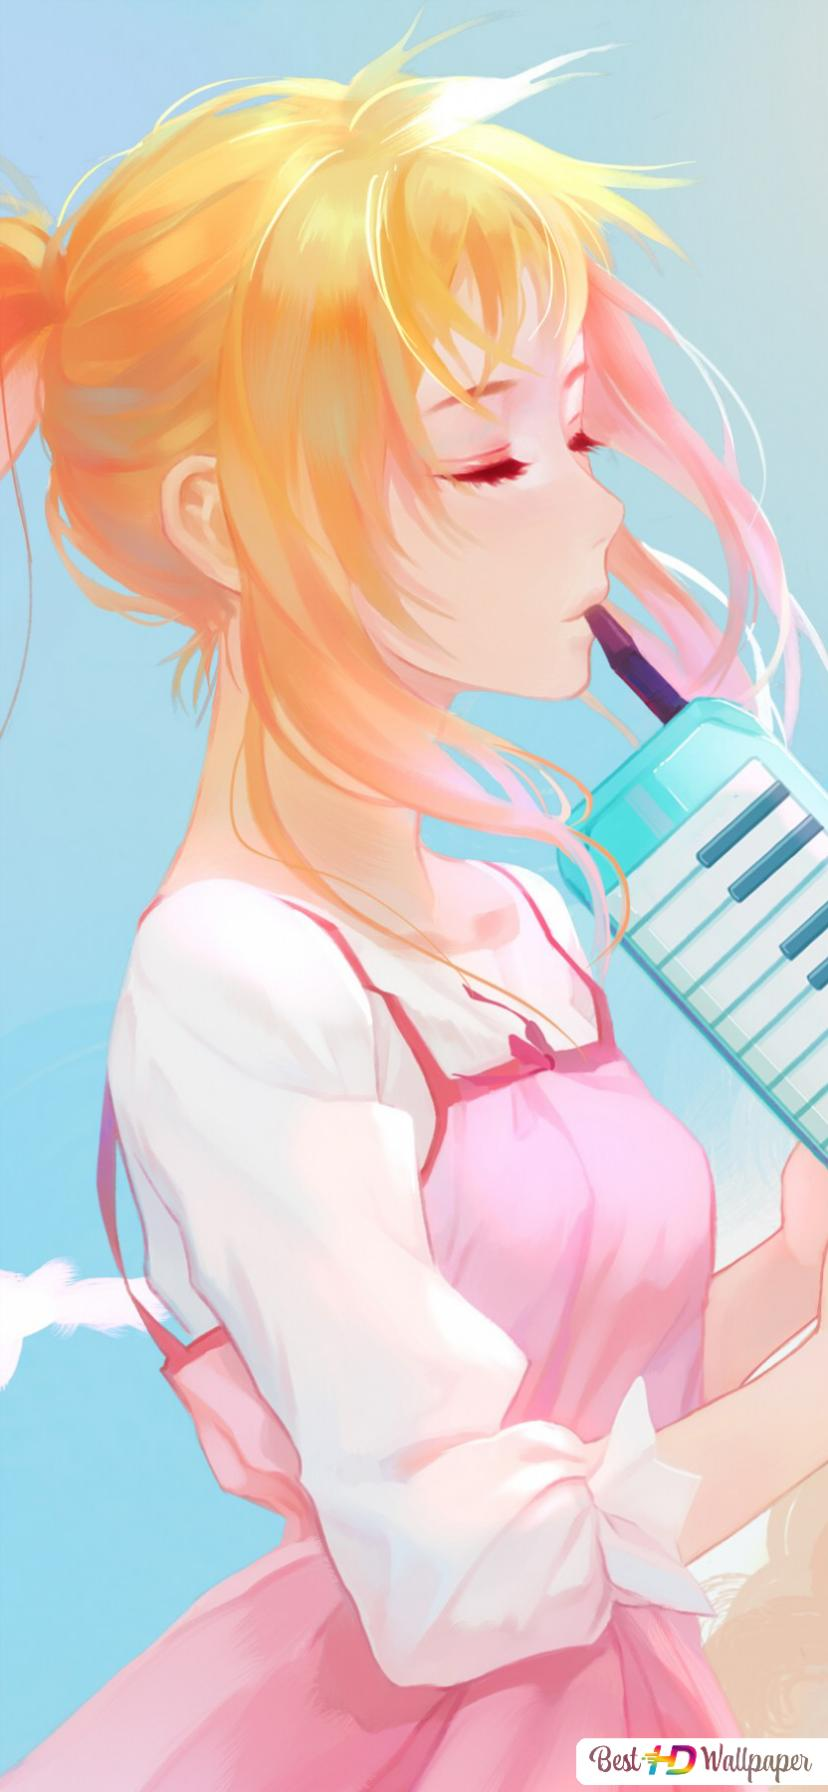 Shigatsu Wa Kimi No Uso Anime And Your Lie In April Hd Wallpaper